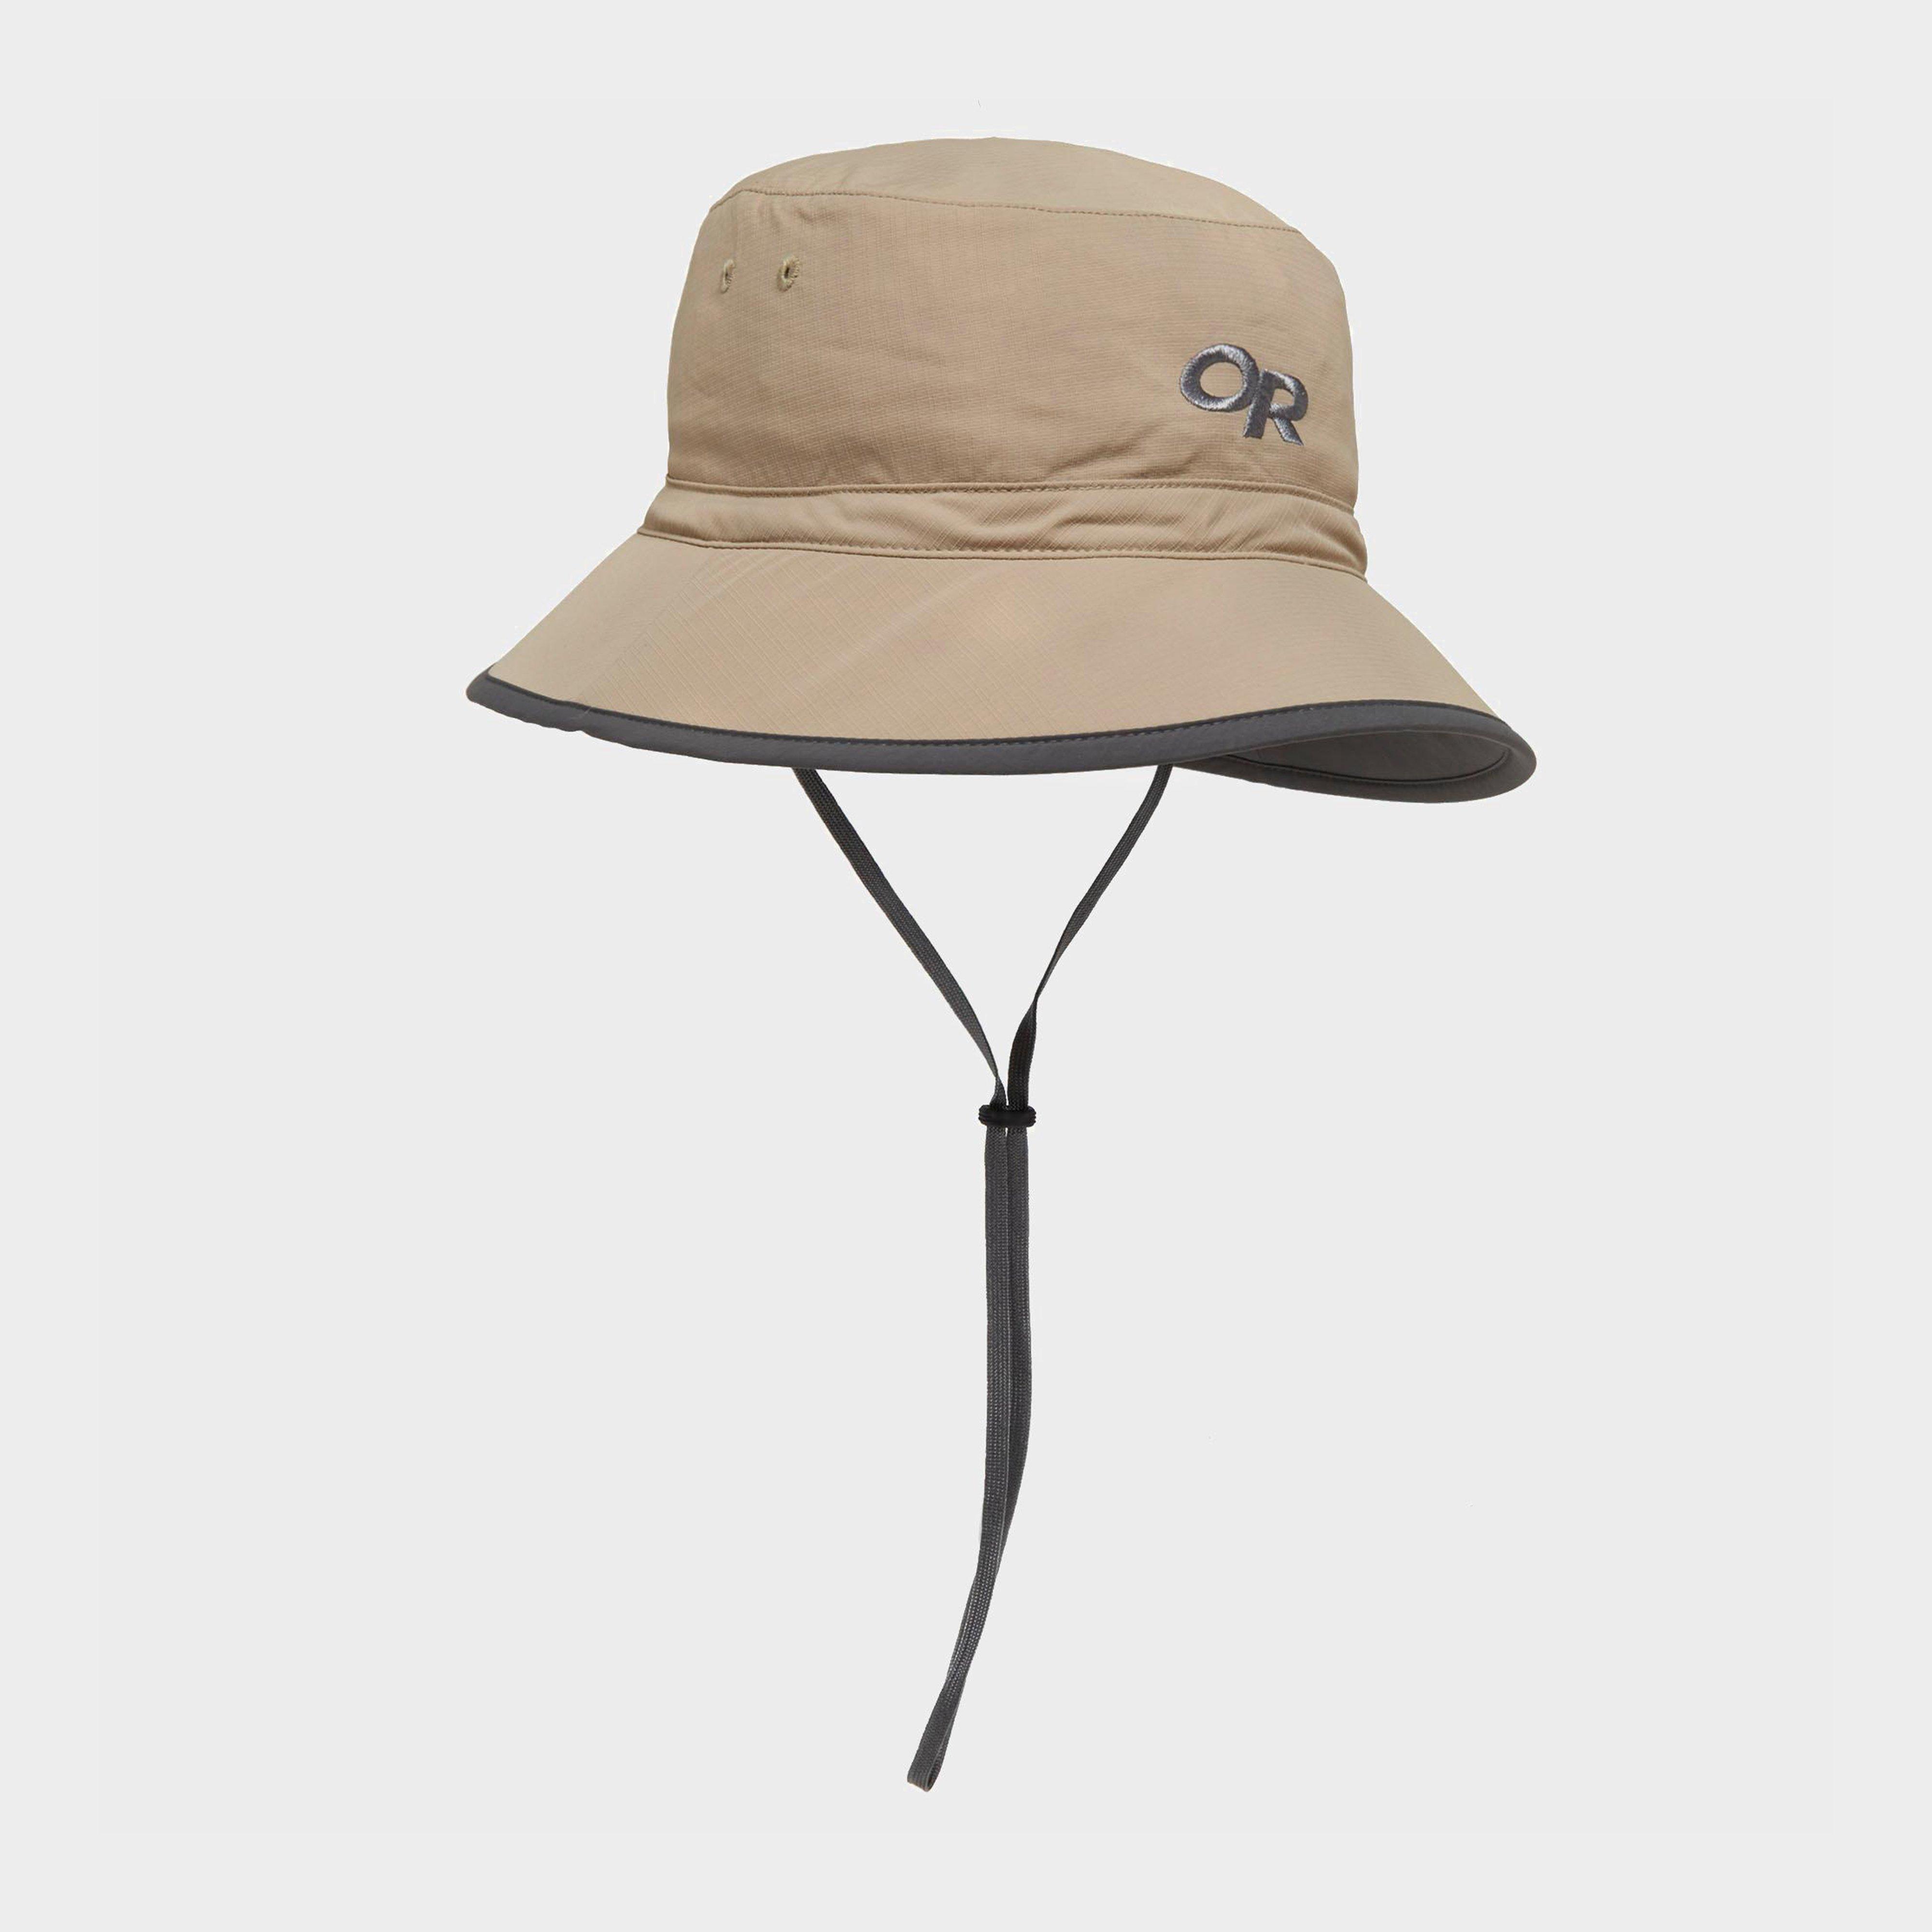 Outdoor Research Outdoor Research Sun Bucket Hat - Khaki, Khaki